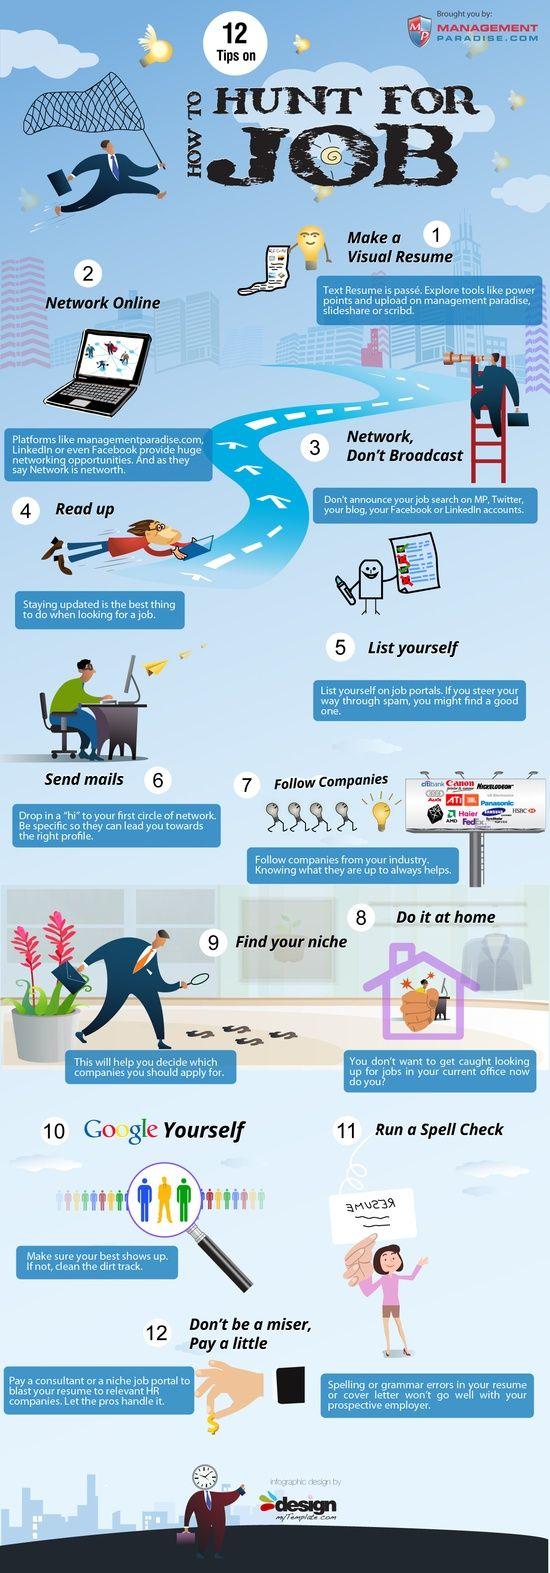 job hunting tips